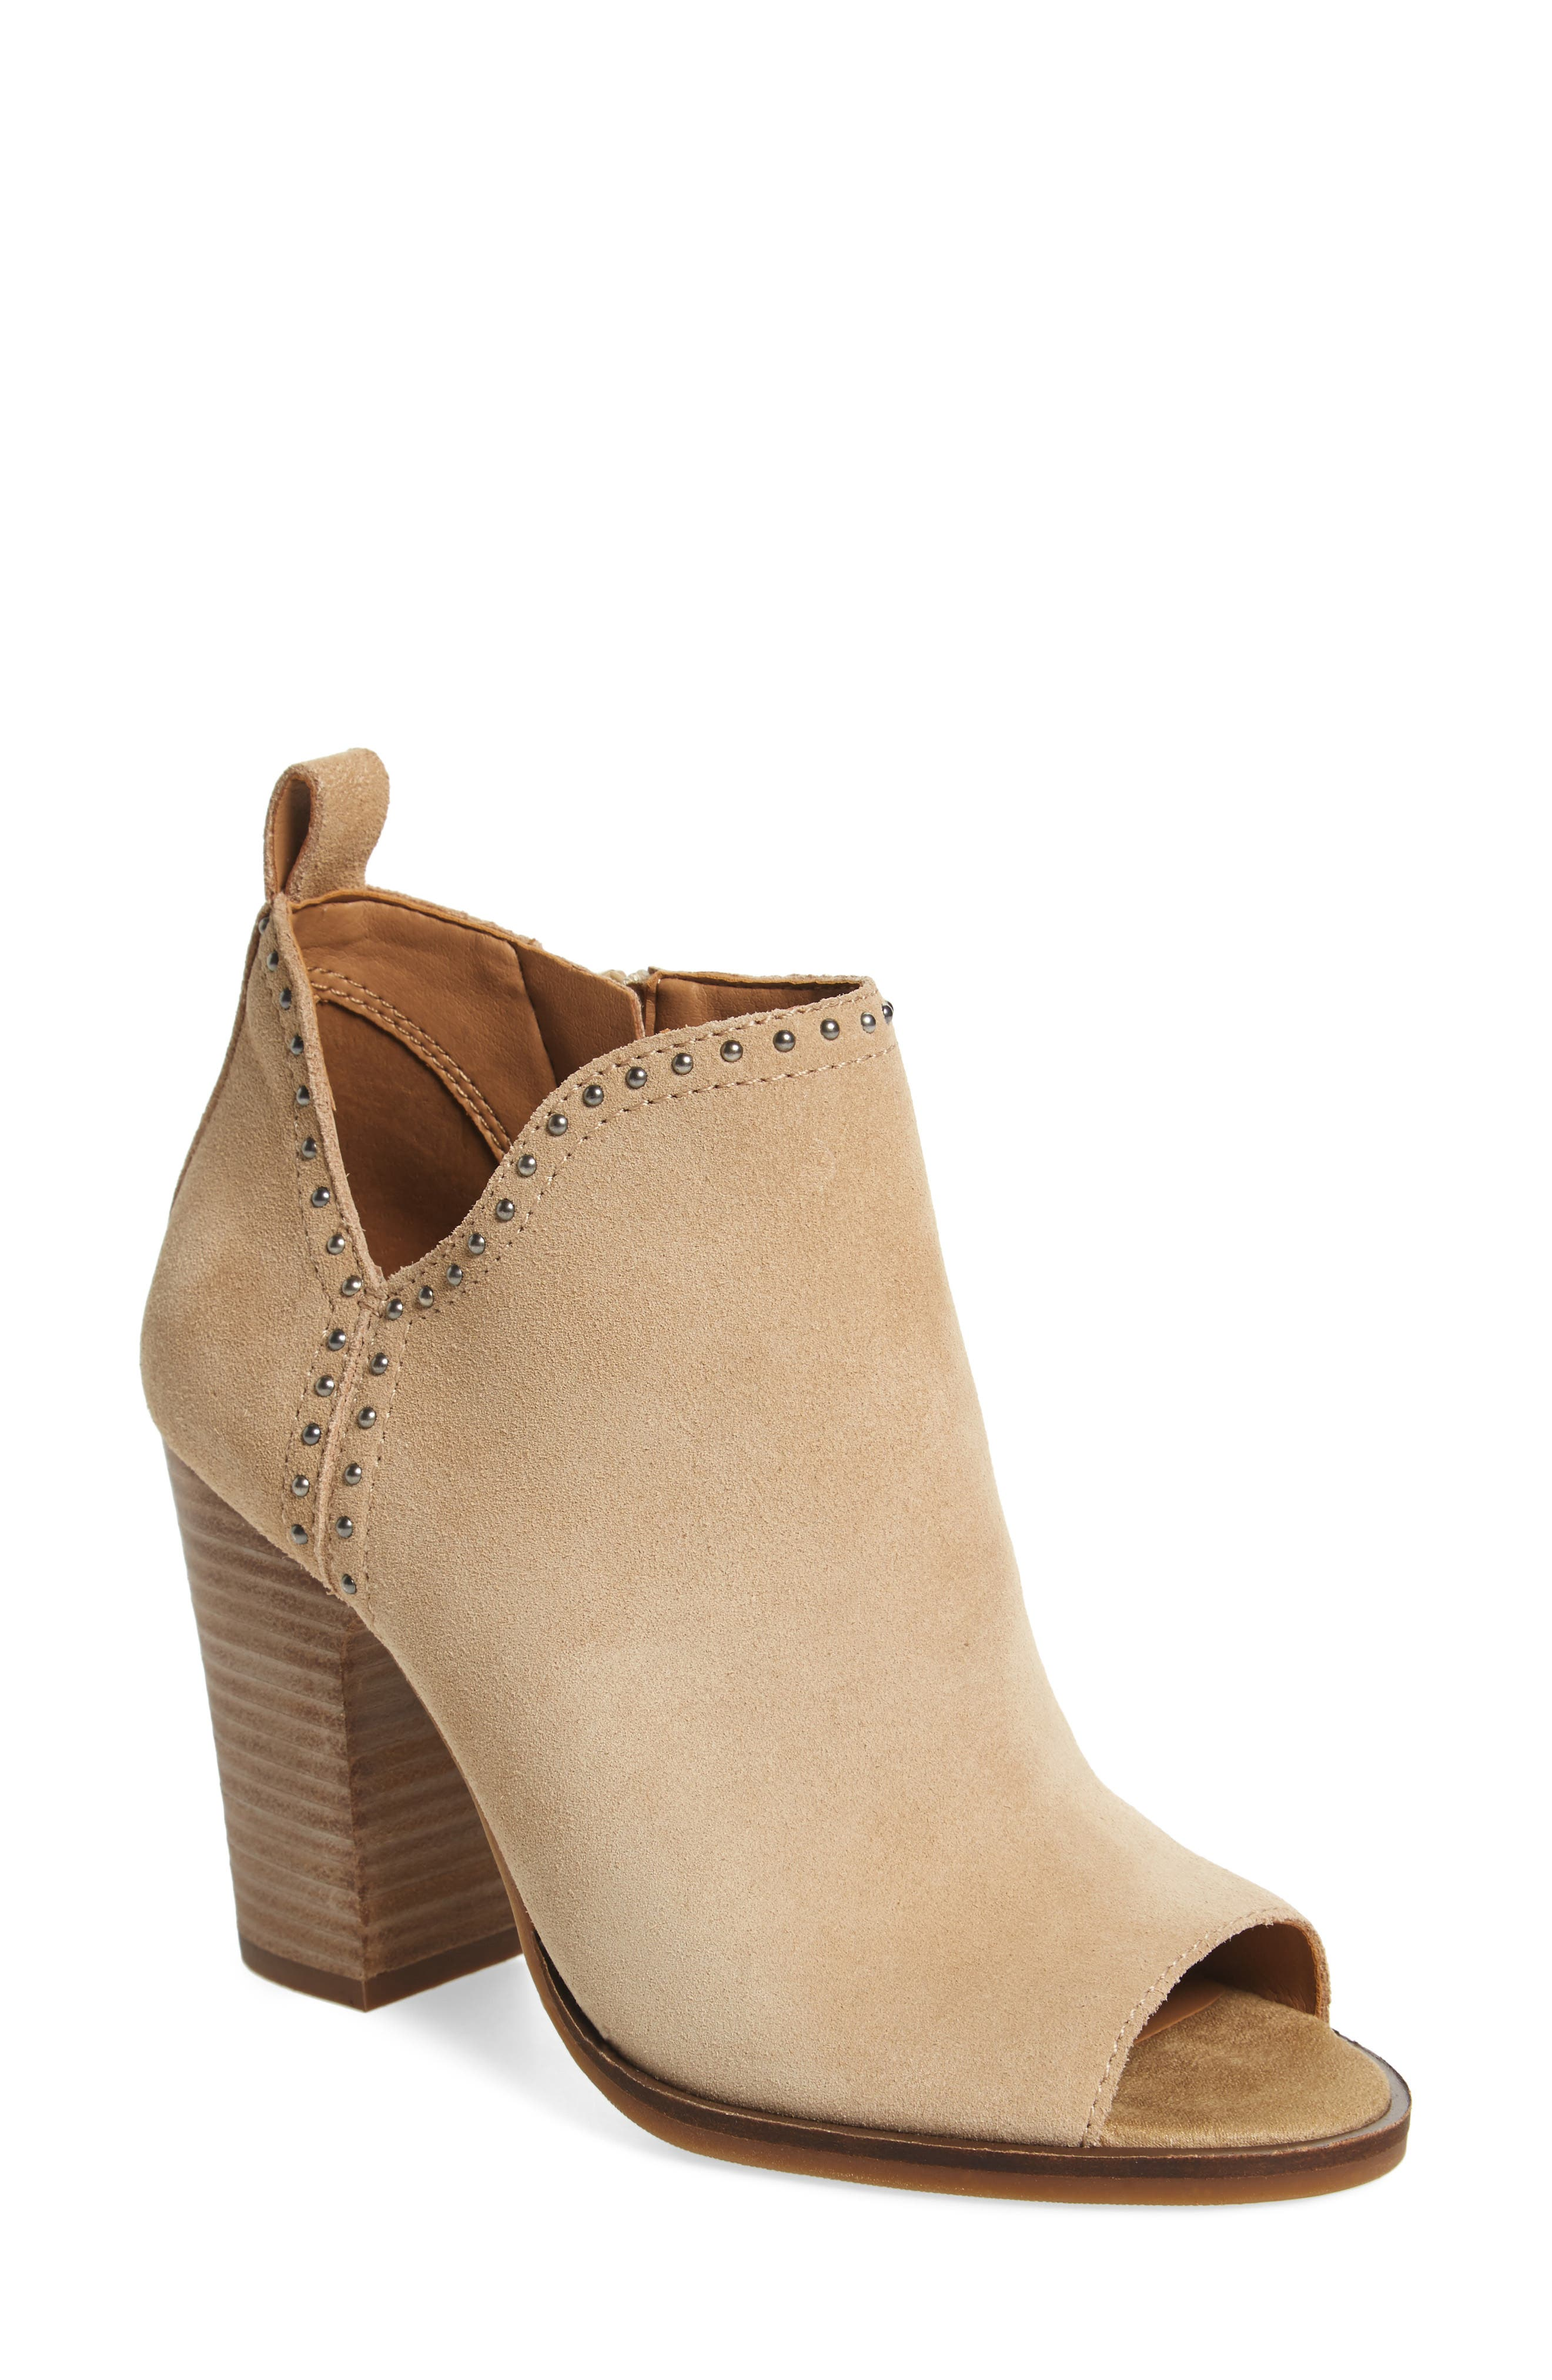 Alternate Image 1 Selected - Lucky Brand Lotisha Studded Open Toe Bootie (Women)